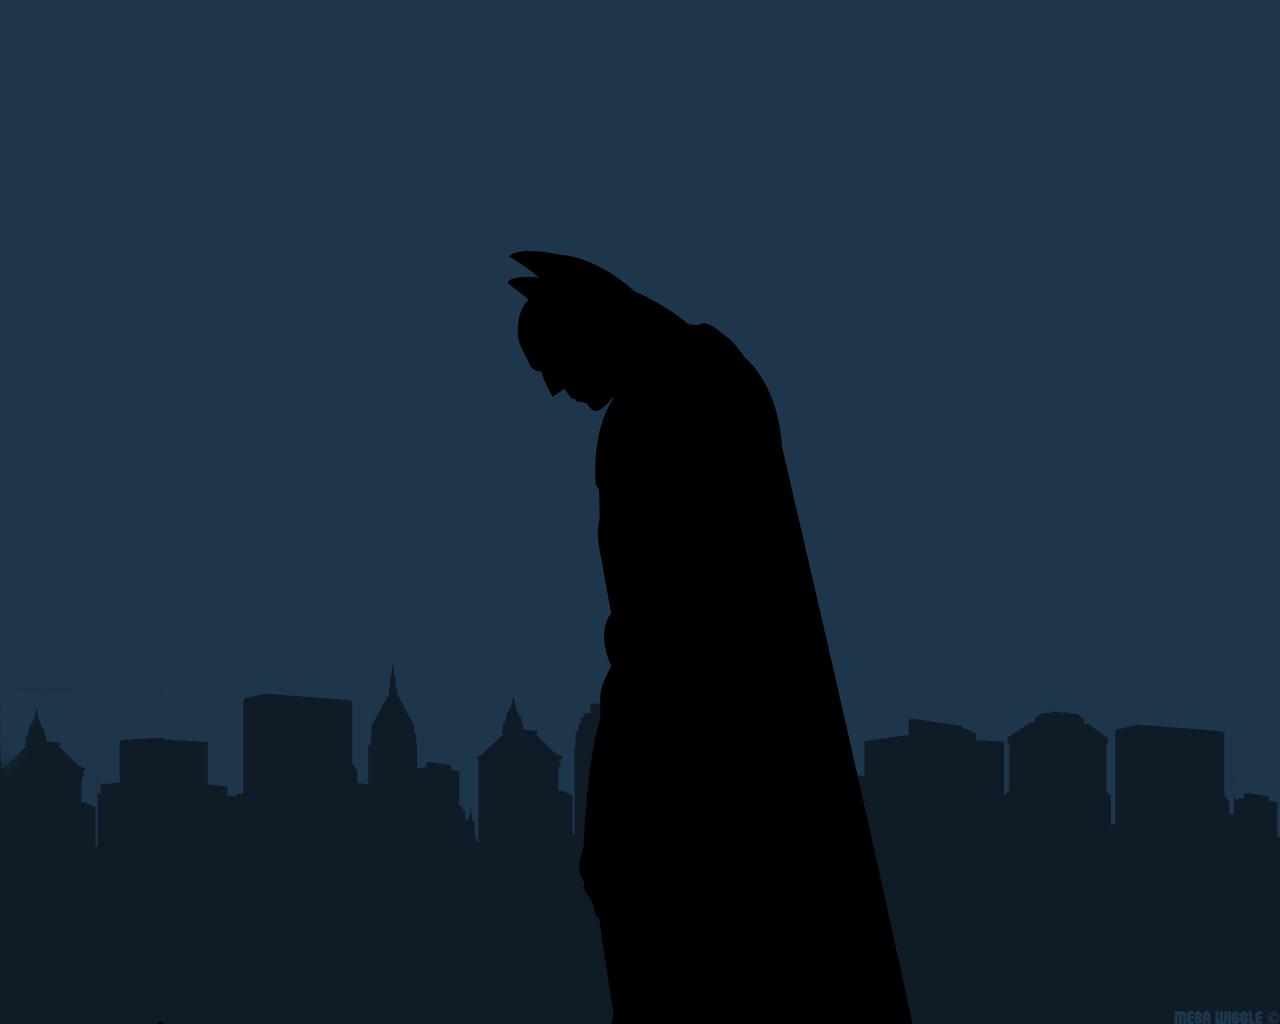 Batman-Minimal-x-1080-Imgur-wallpaper-wp3402894